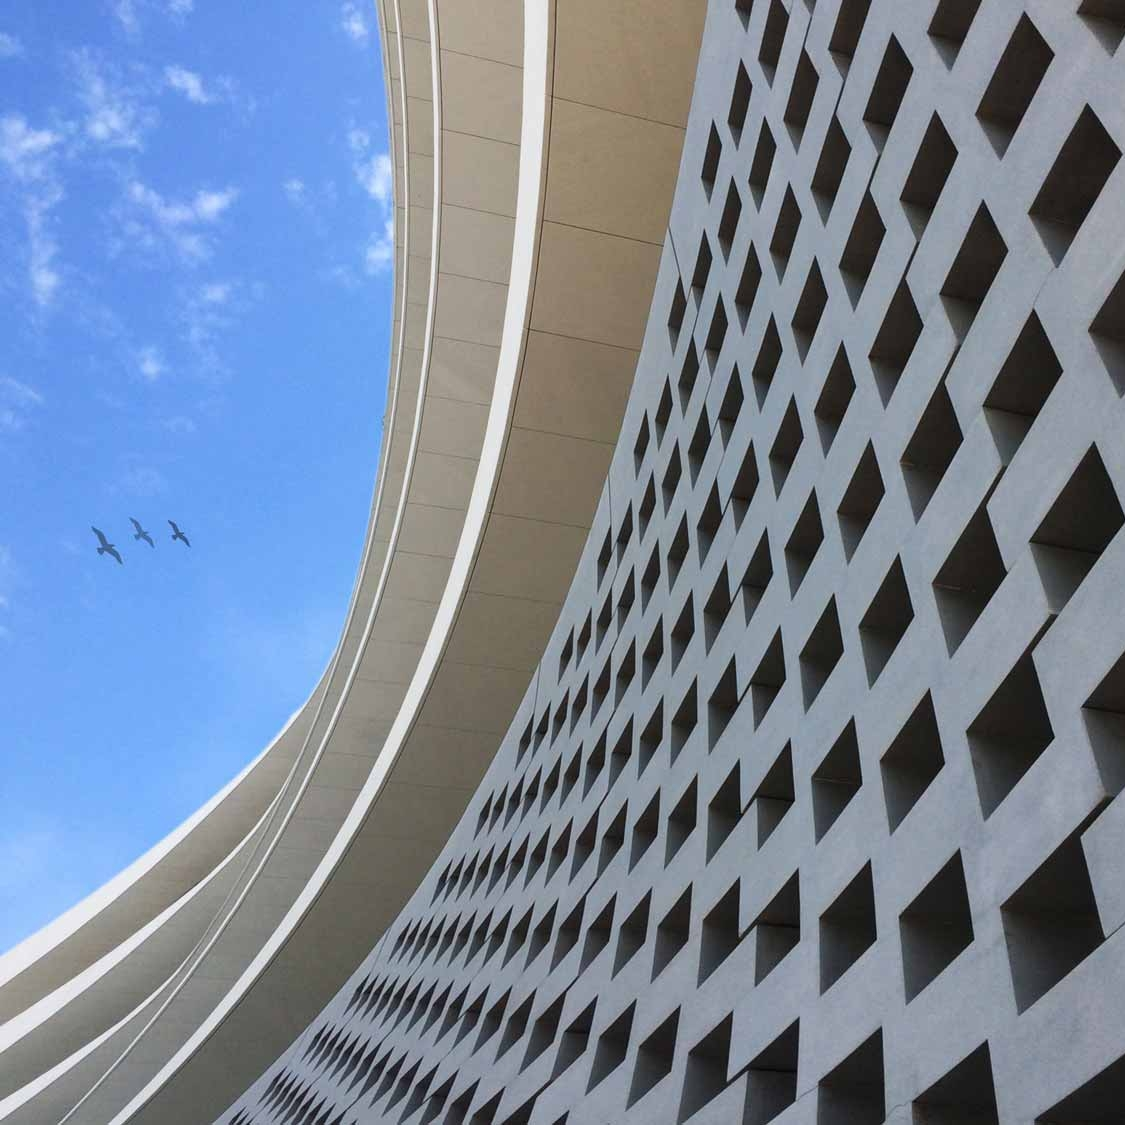 ....Office Building Façade In Athens..ΠΡΟΣΟΨΗ ΚΤΙΡΙΟΥ ΓΡΑΦΕΙΩΝ ΣΤΗΝ ΑΘΗΝΑ.... -